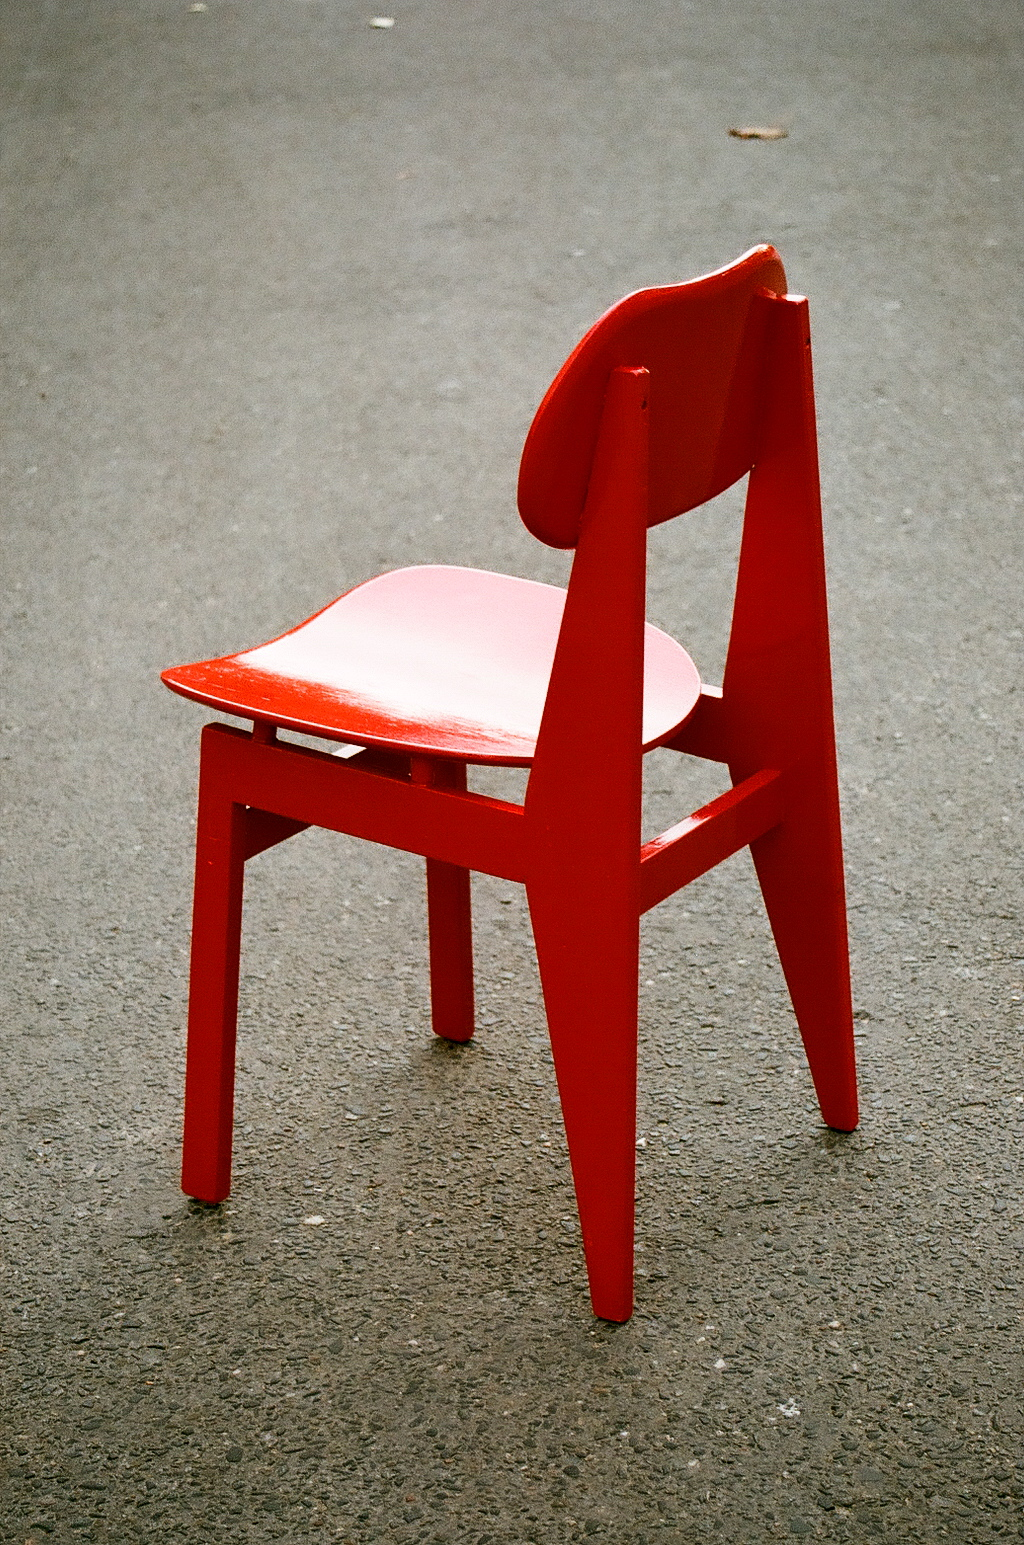 Hartz IV Möbel: Kreuzberg 36 Chair